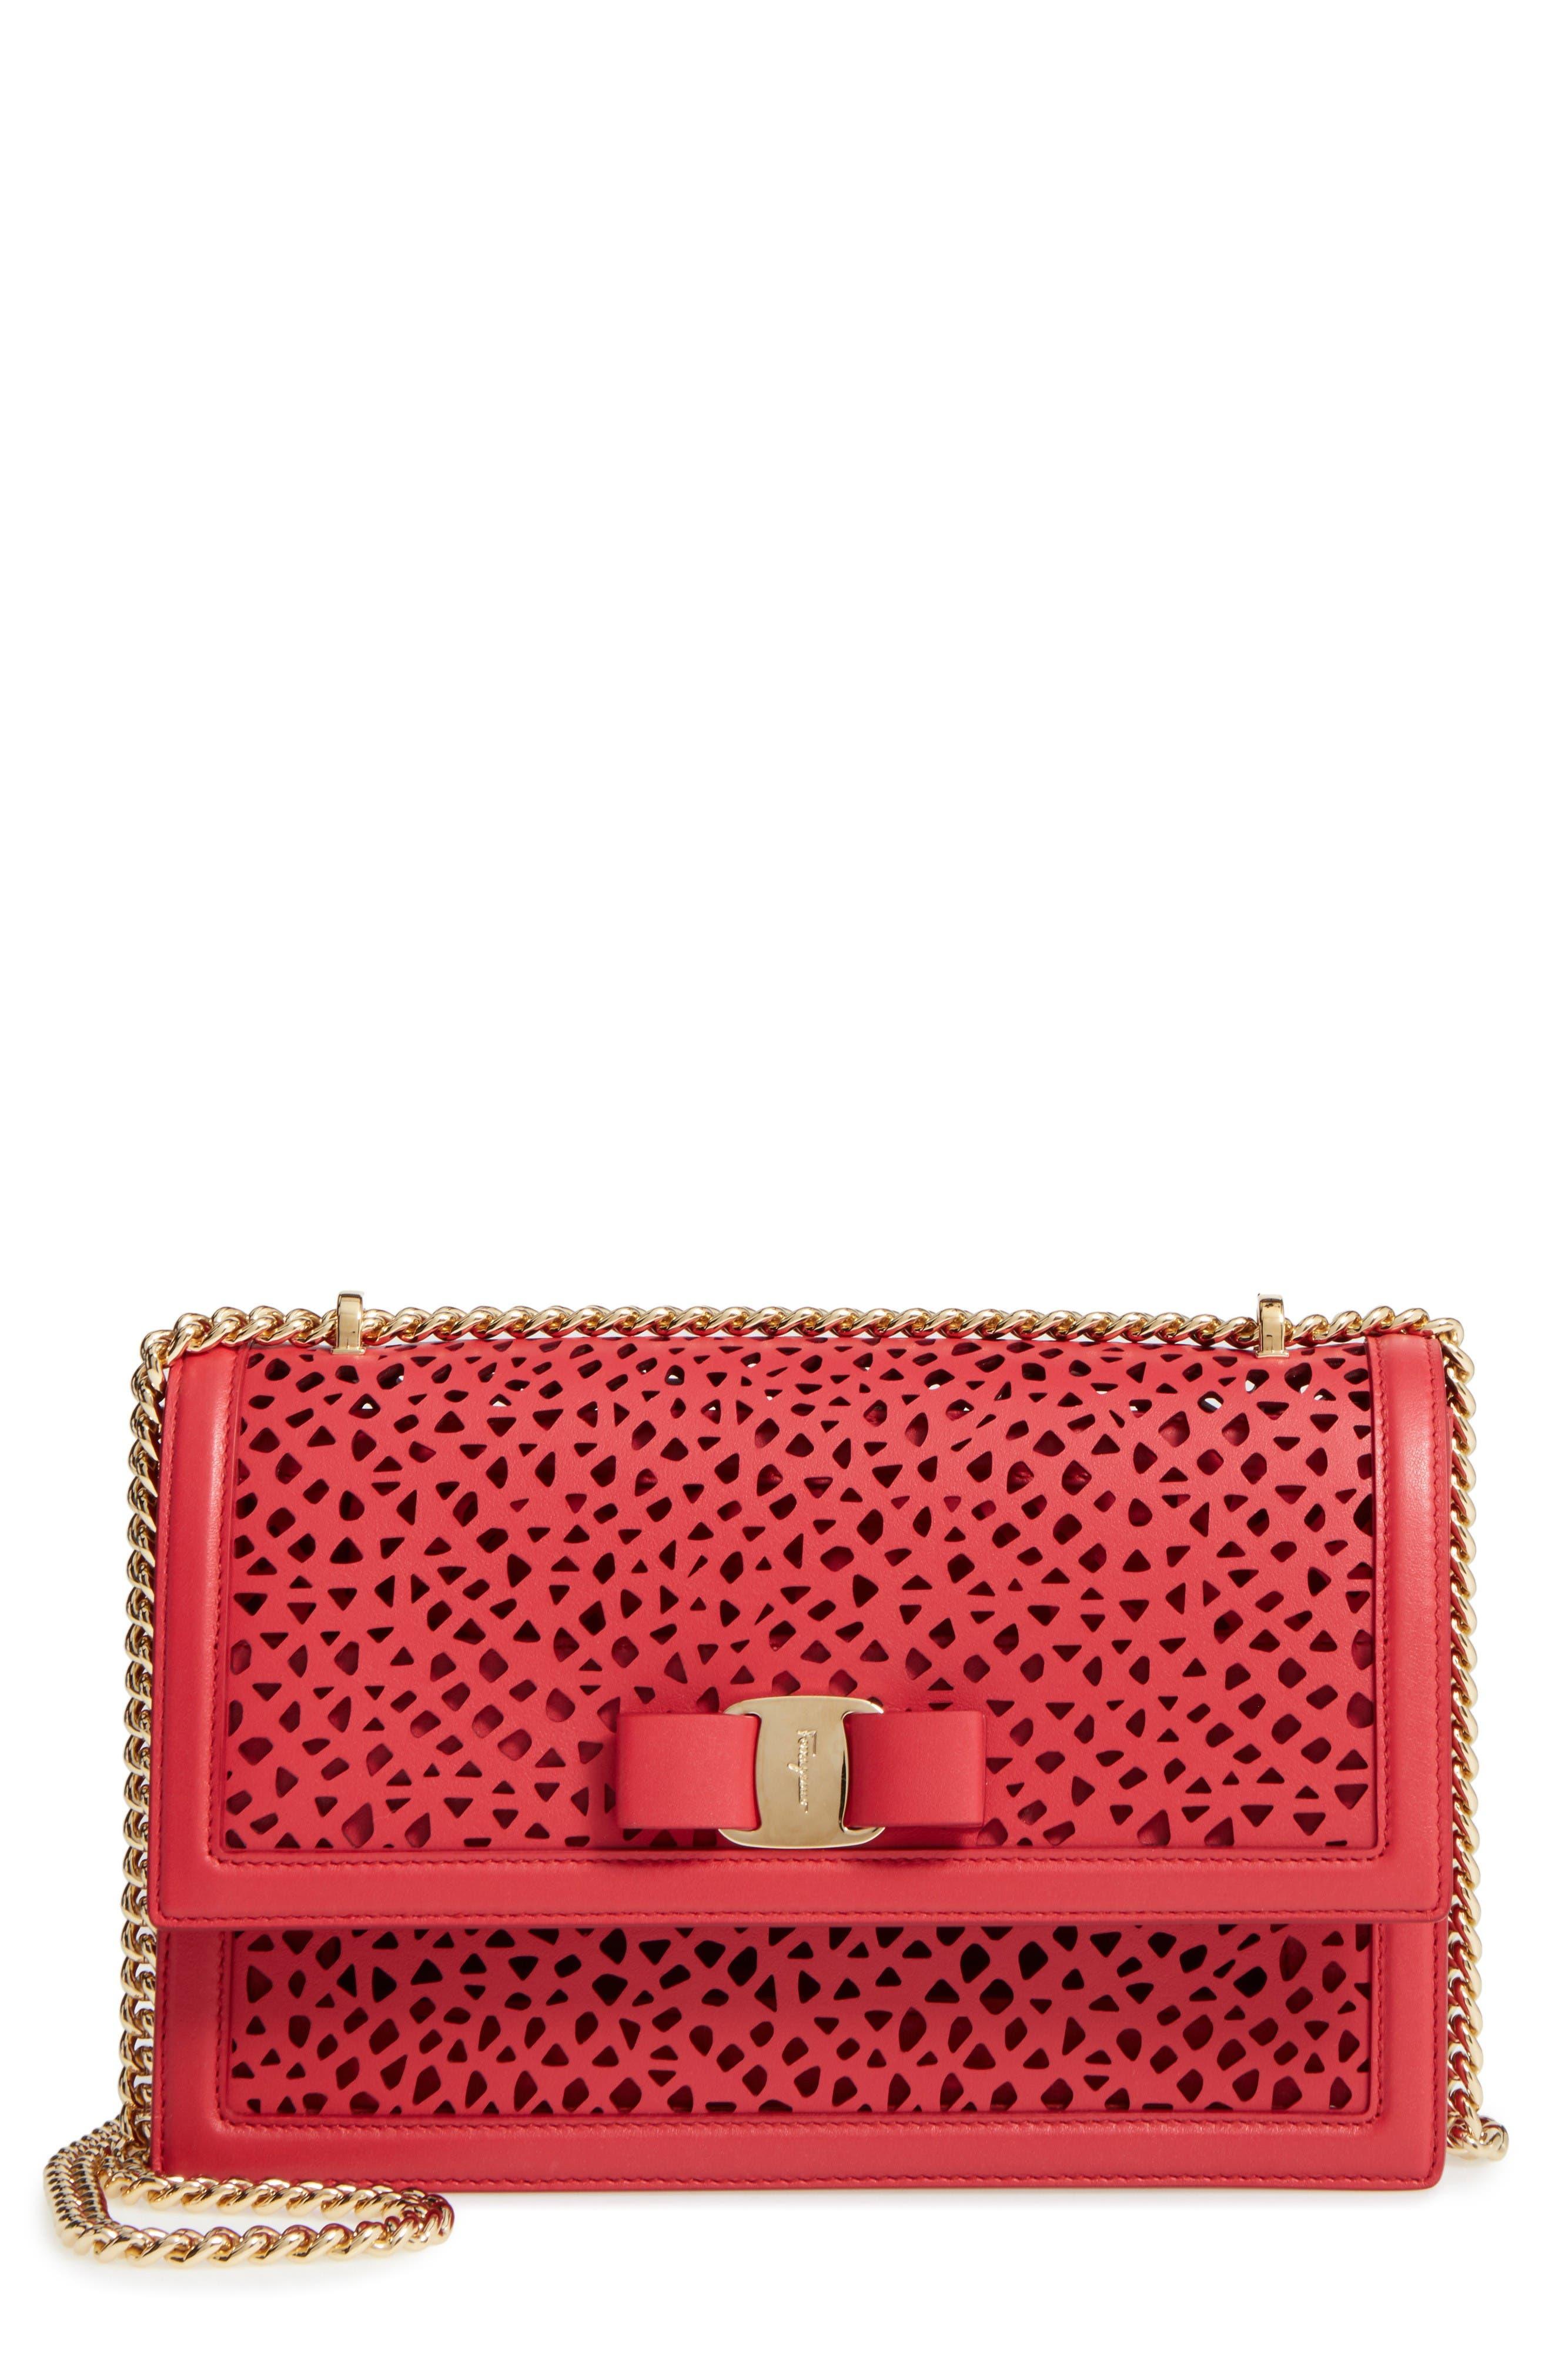 Main Image - Salvatore Ferragamo Medium Ginny Leather Shoulder Bag